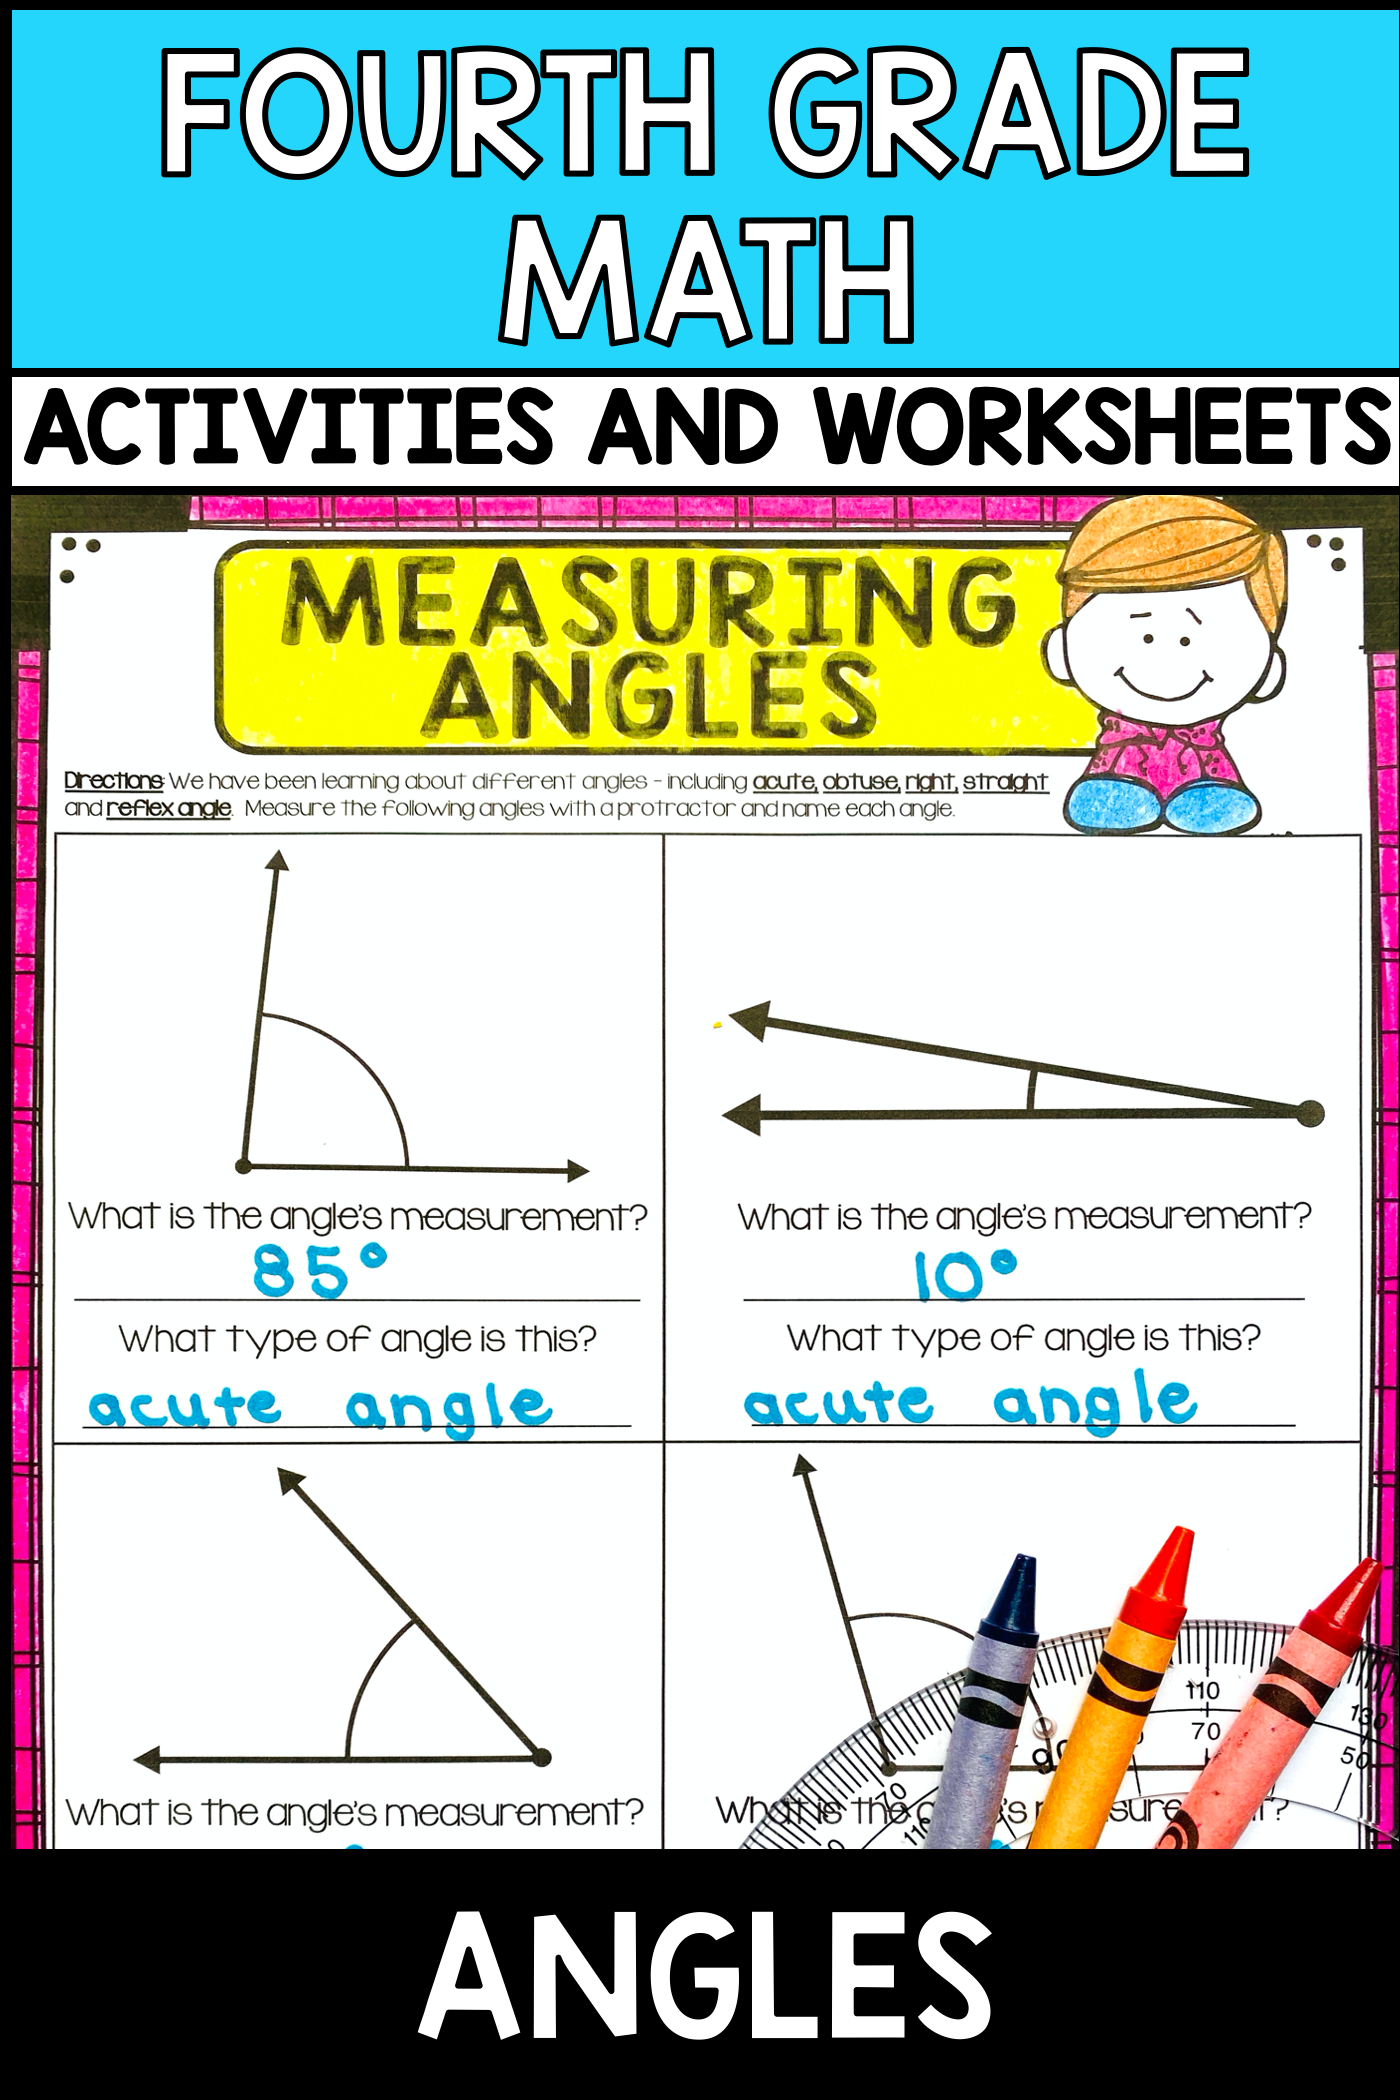 medium resolution of Angles   4th Grade   NO PREP   Measuring angles